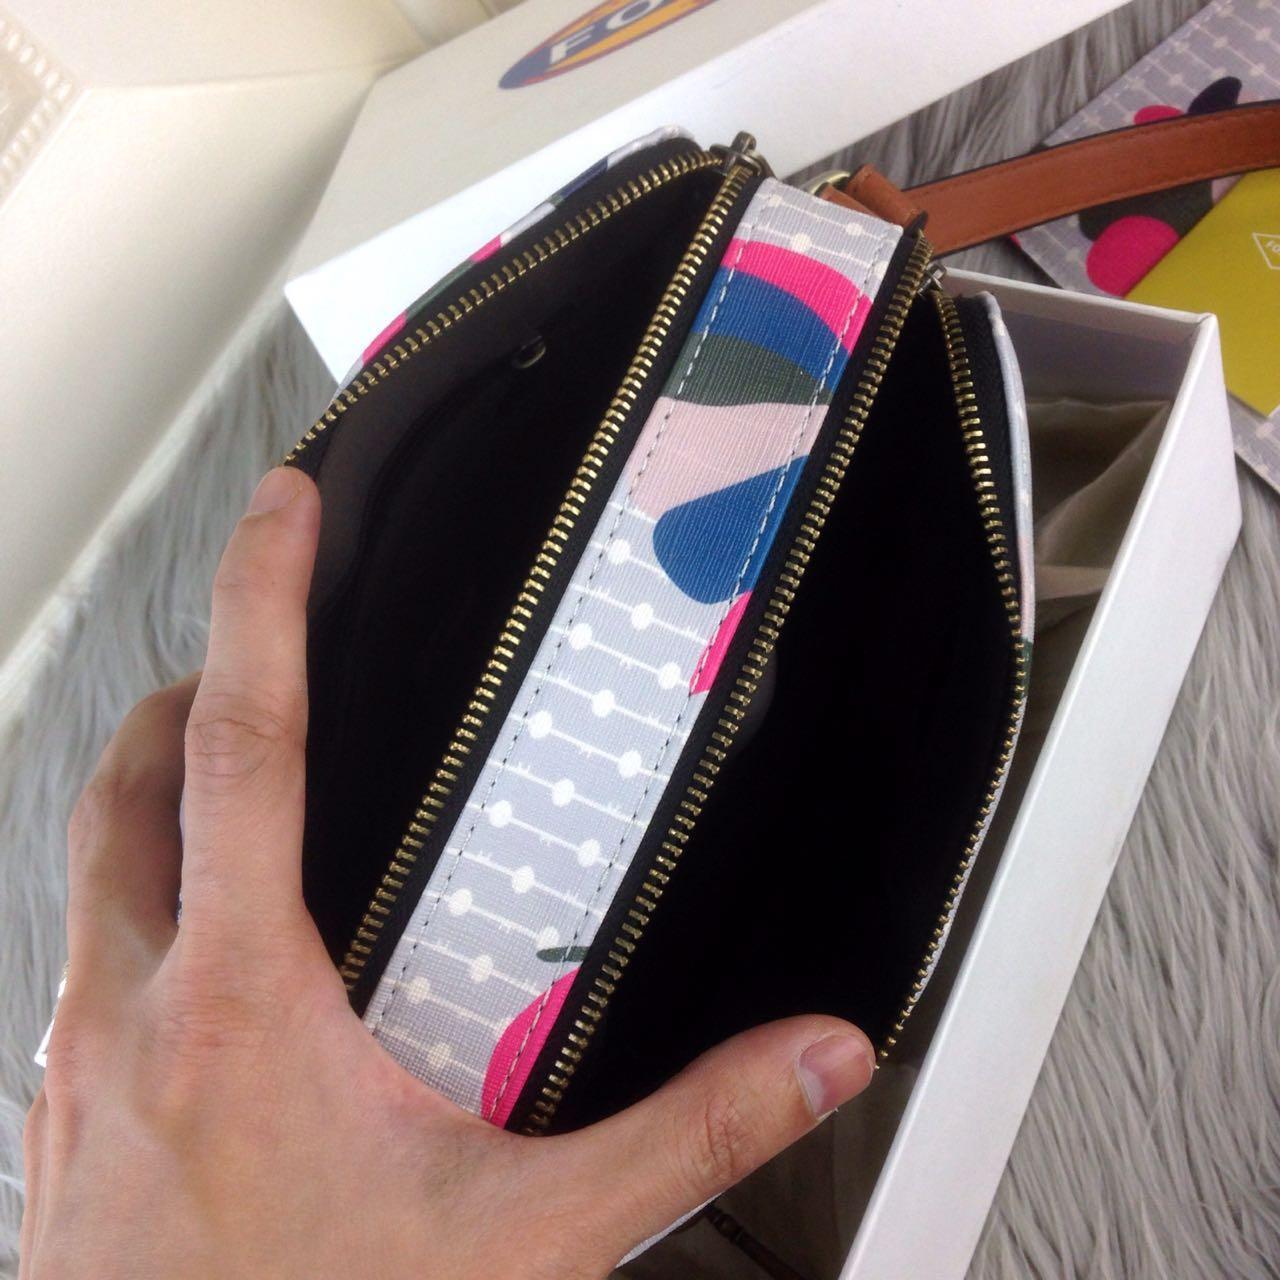 Fitur Tas Wanita Fossil Piper Toaster Floral Multi Grey Double Zip Sydney Satchel Neutral Stripe Putih Bag Ss18 3